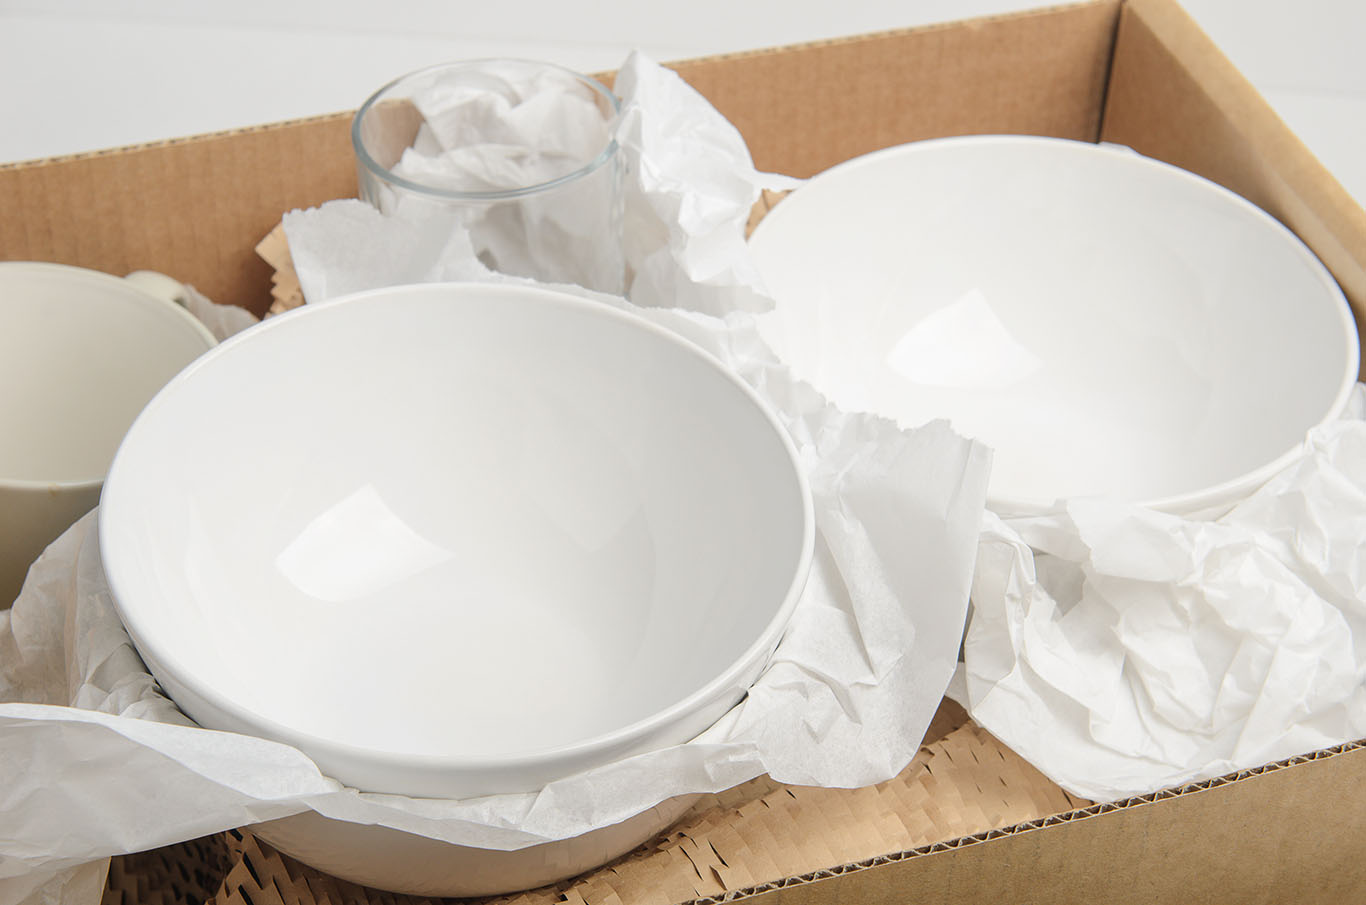 Umzug - Geschirr verpacken